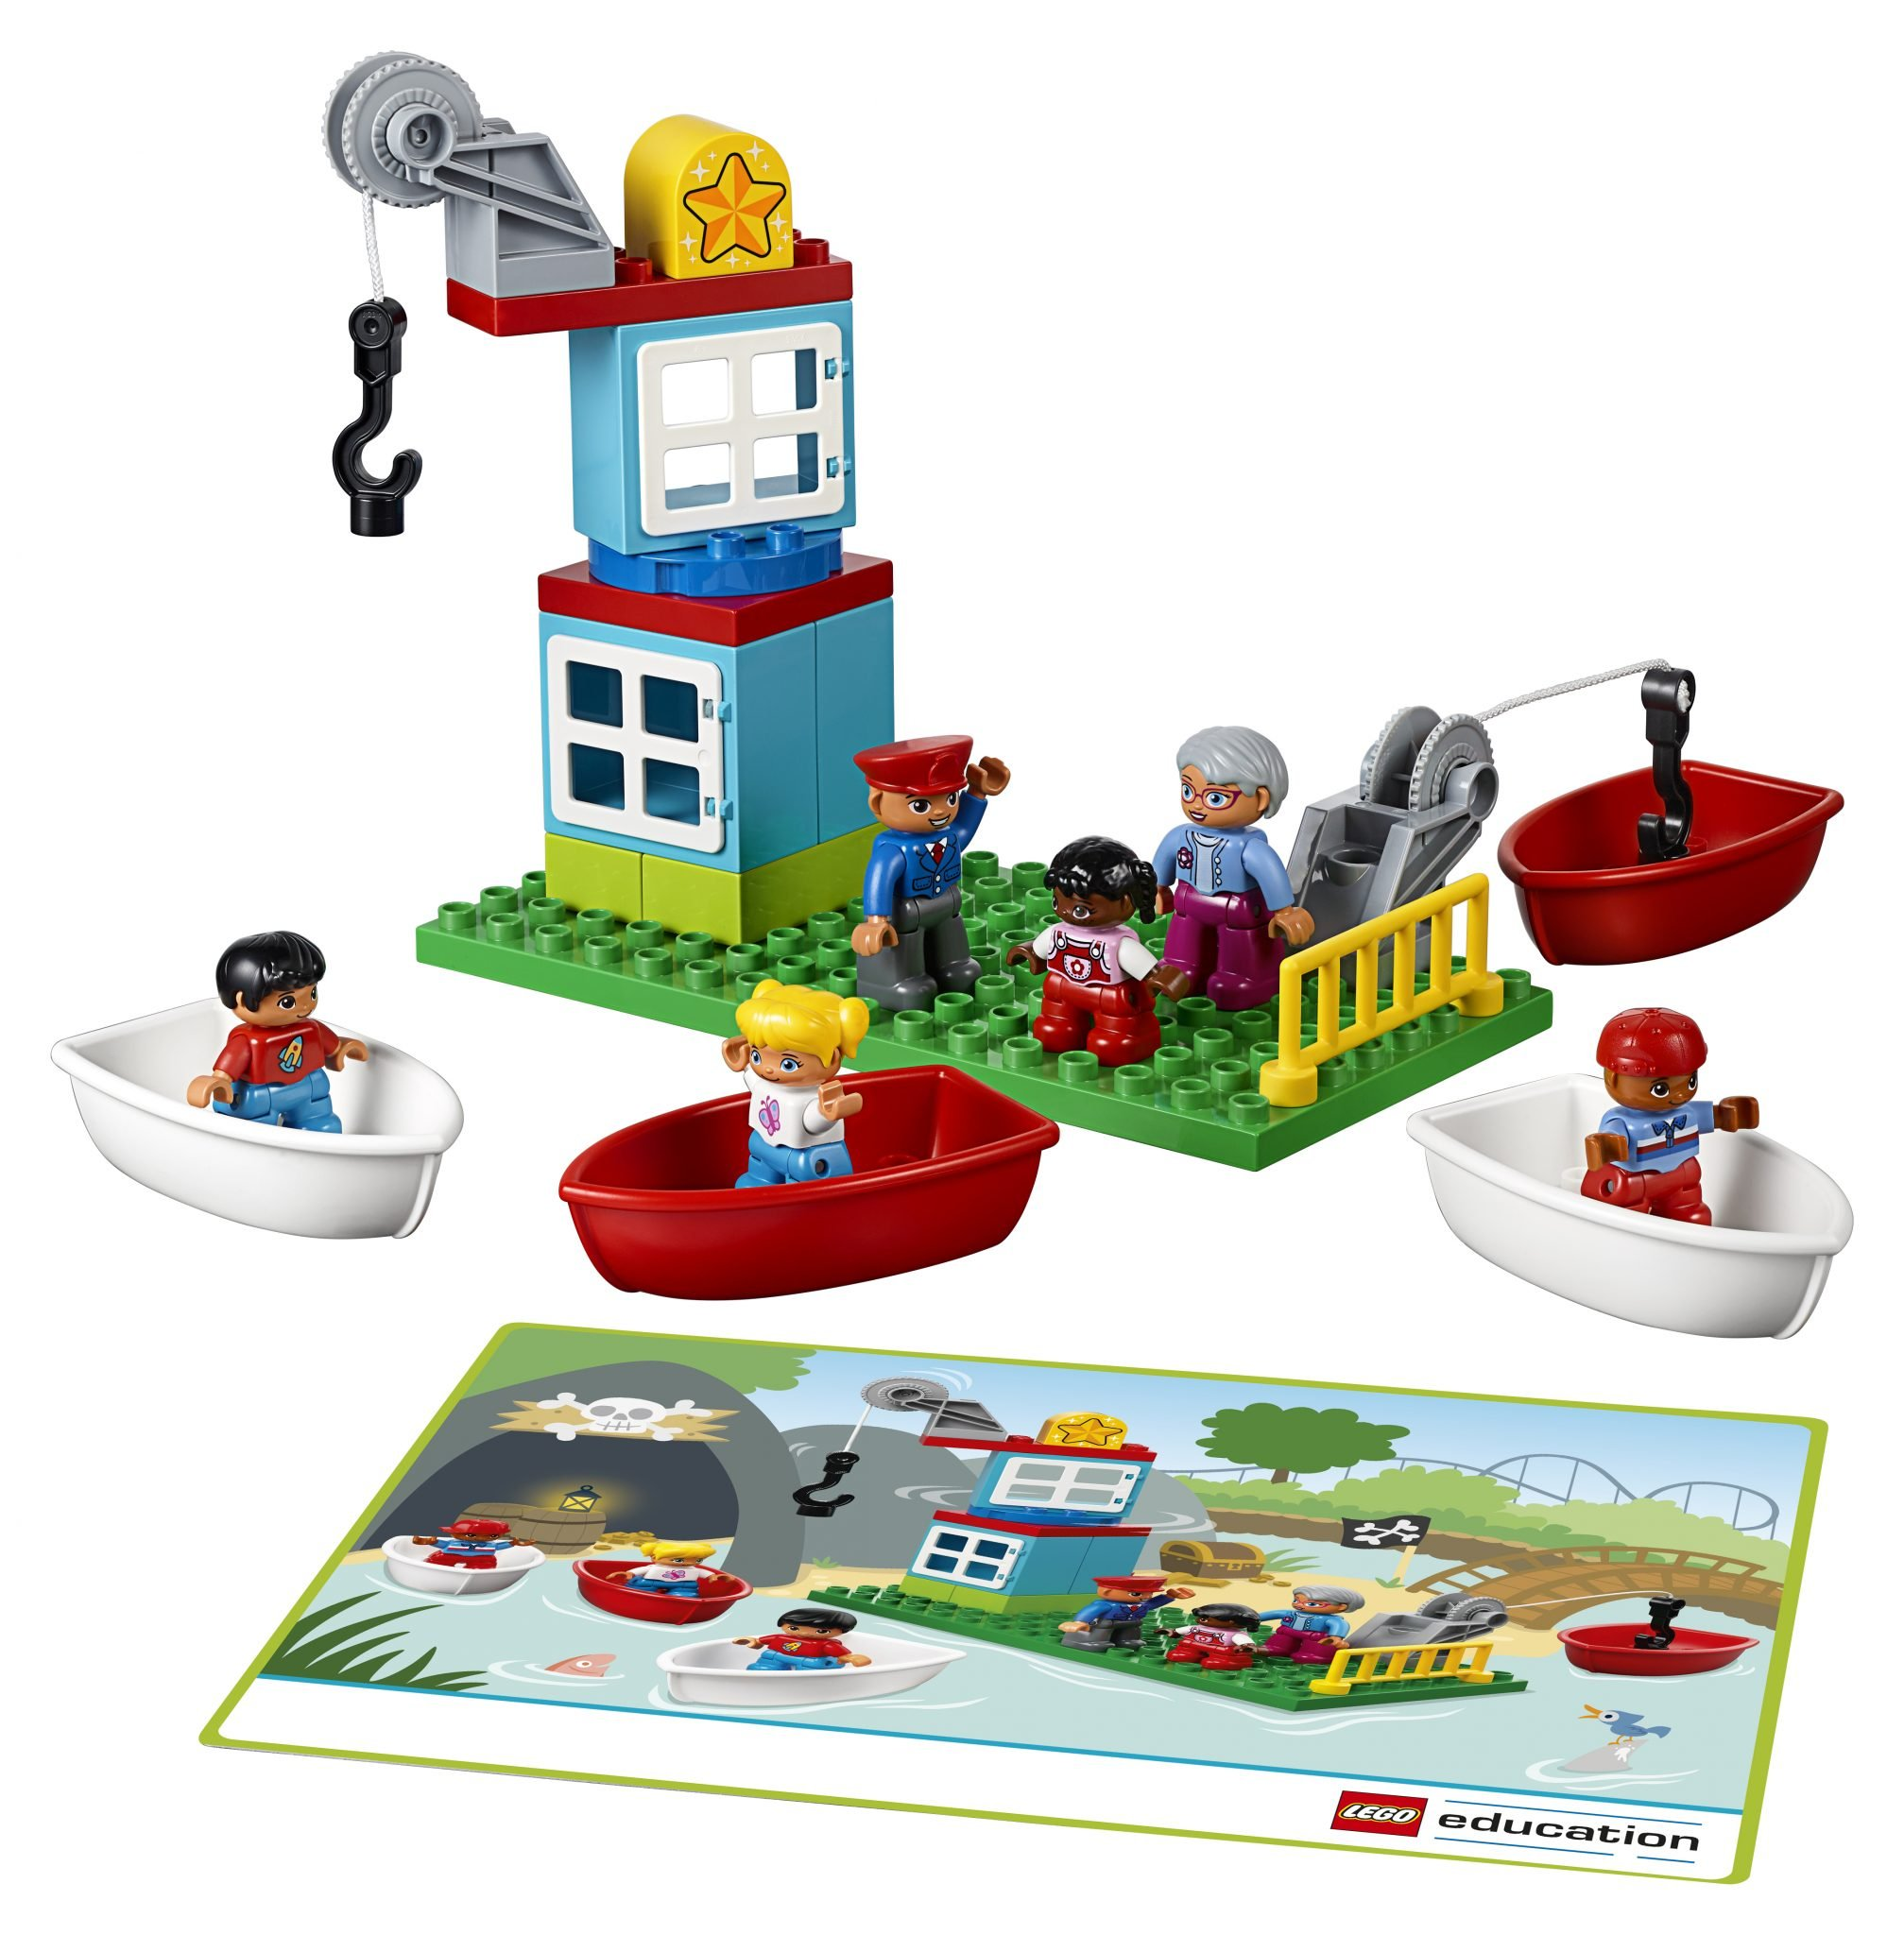 LEGO Education STEAM Park - create, explore and investigate